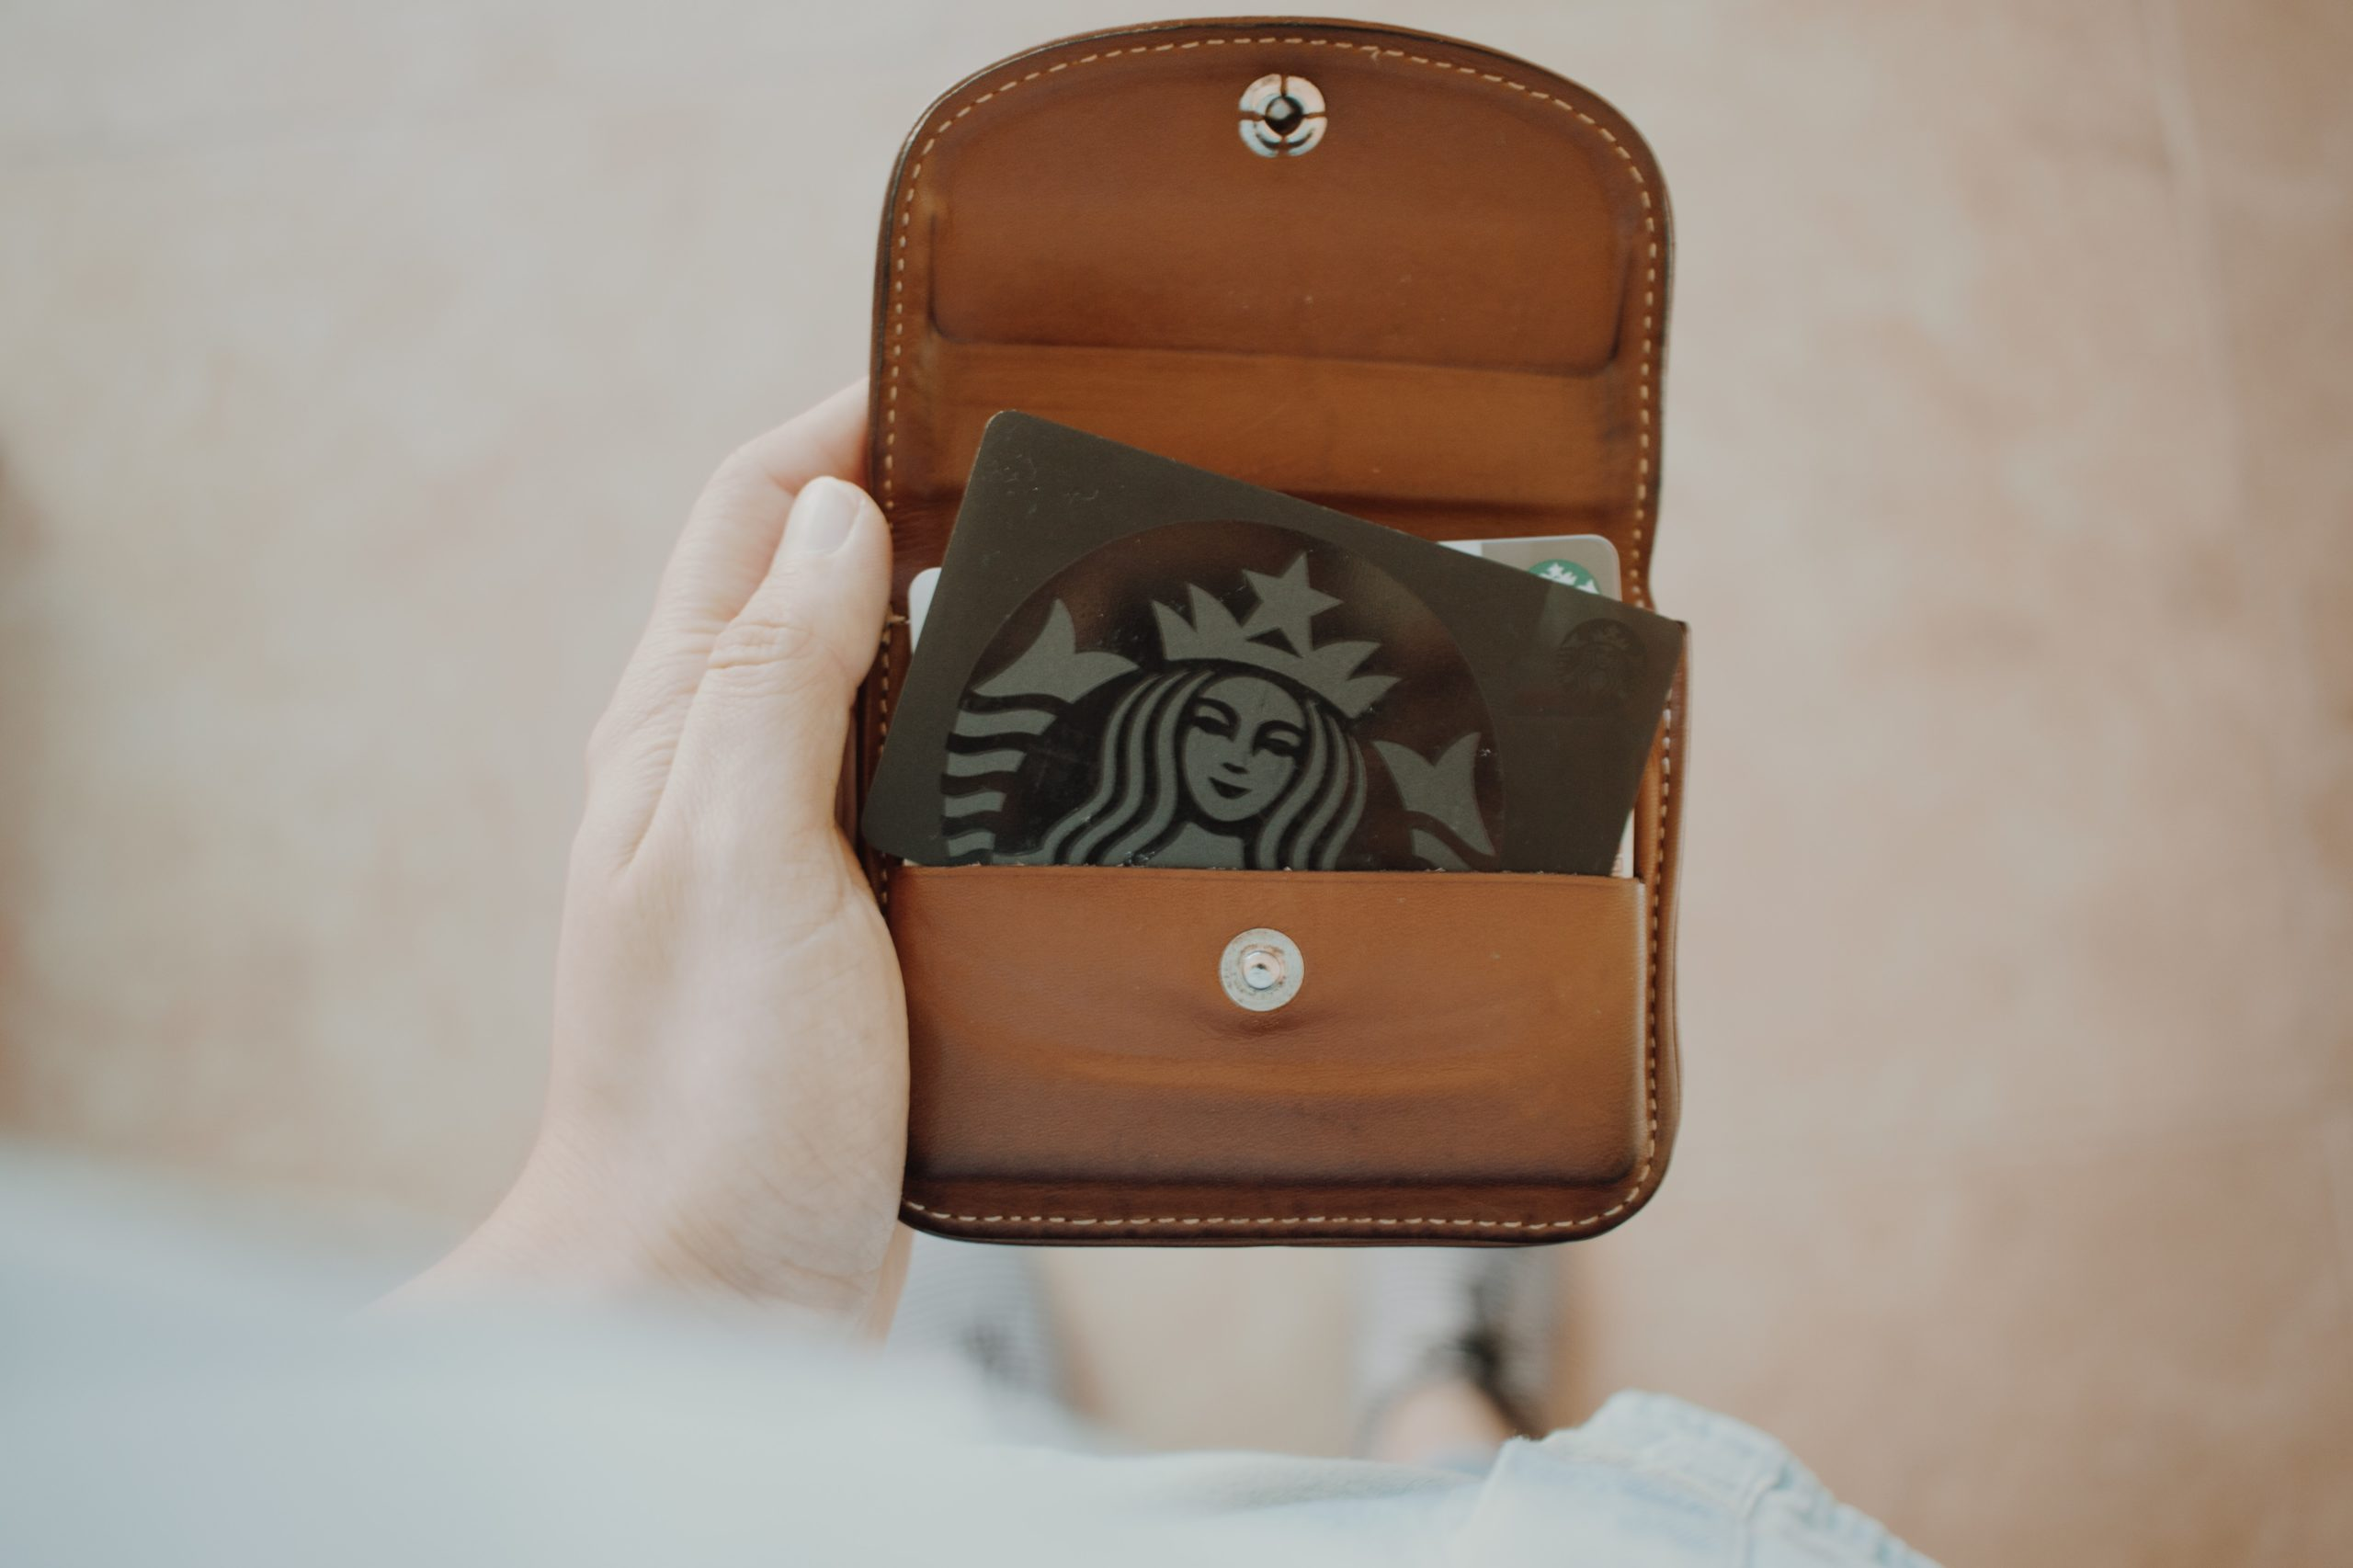 Starbucks Loyalty rewards